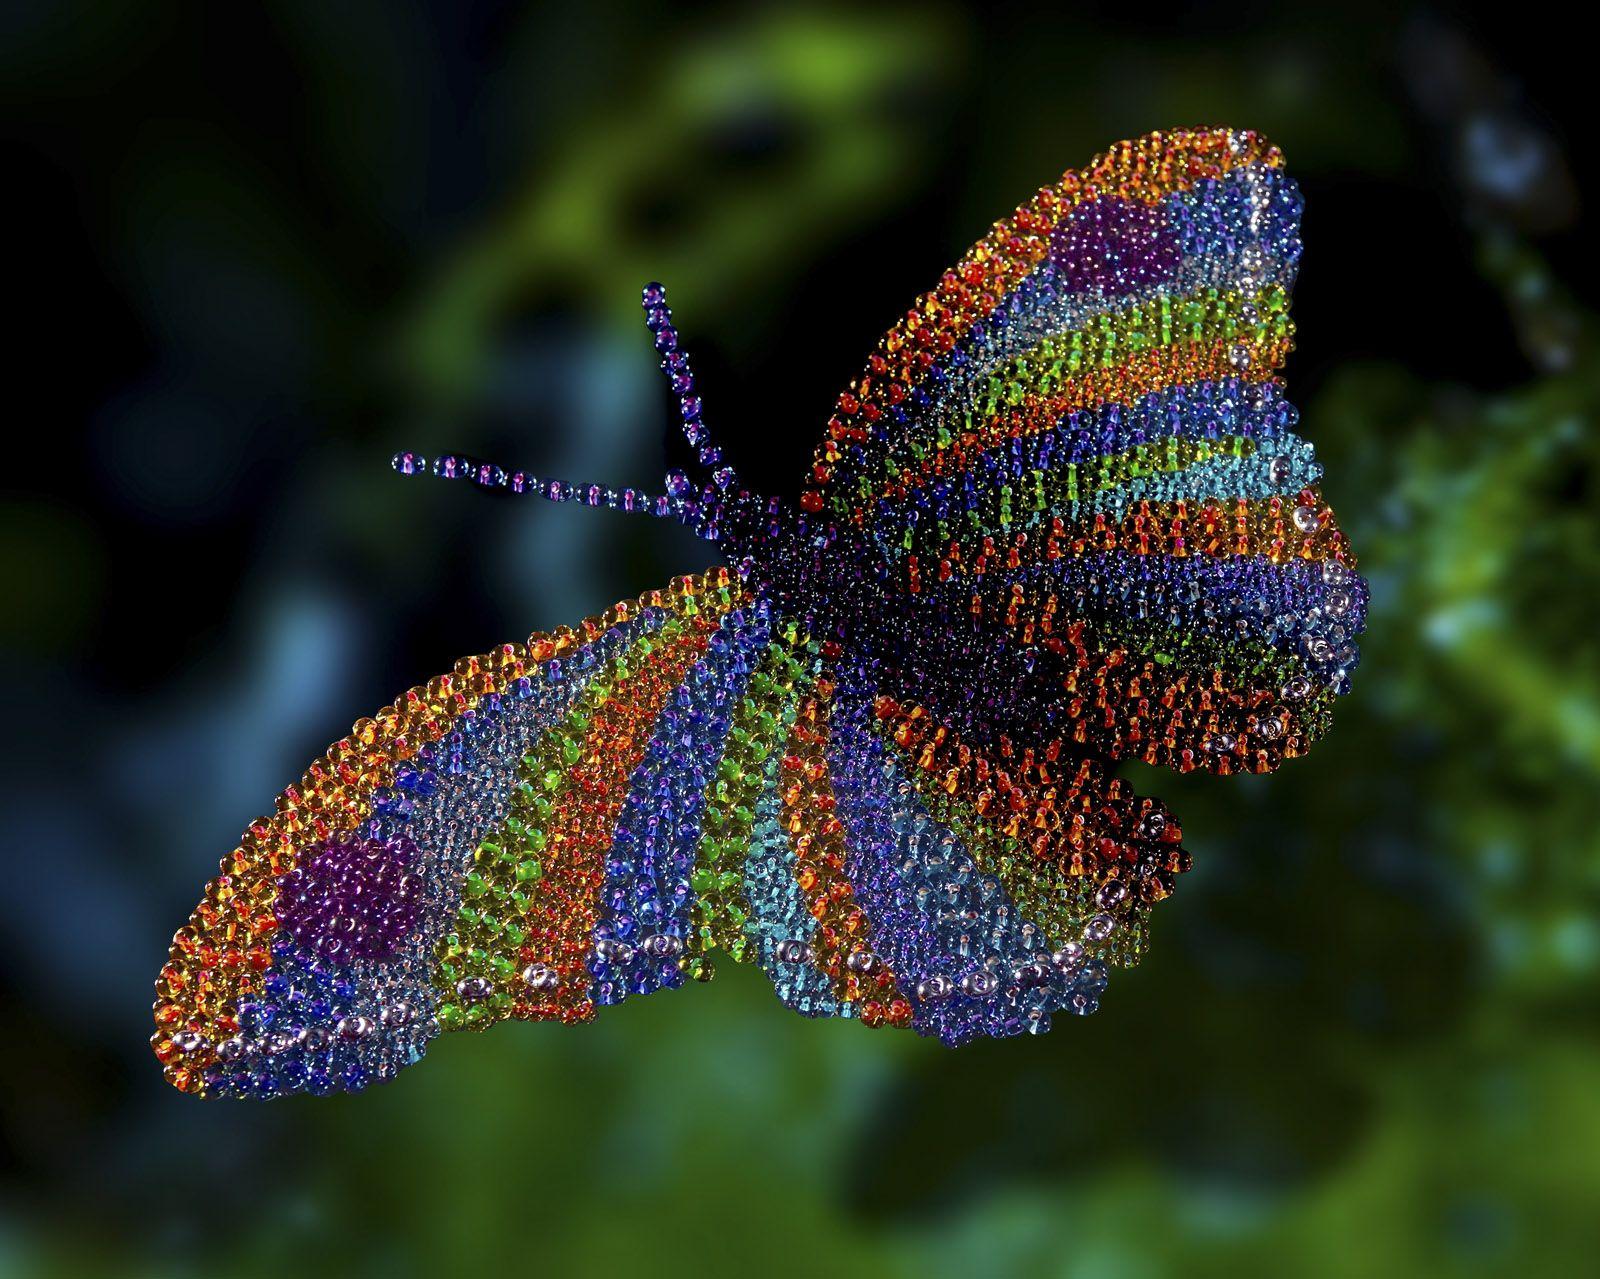 Czech glass seed beads, PRECIOSA Farfalle™, Berry Beads, Peanut Beads|Preciosa Ornela